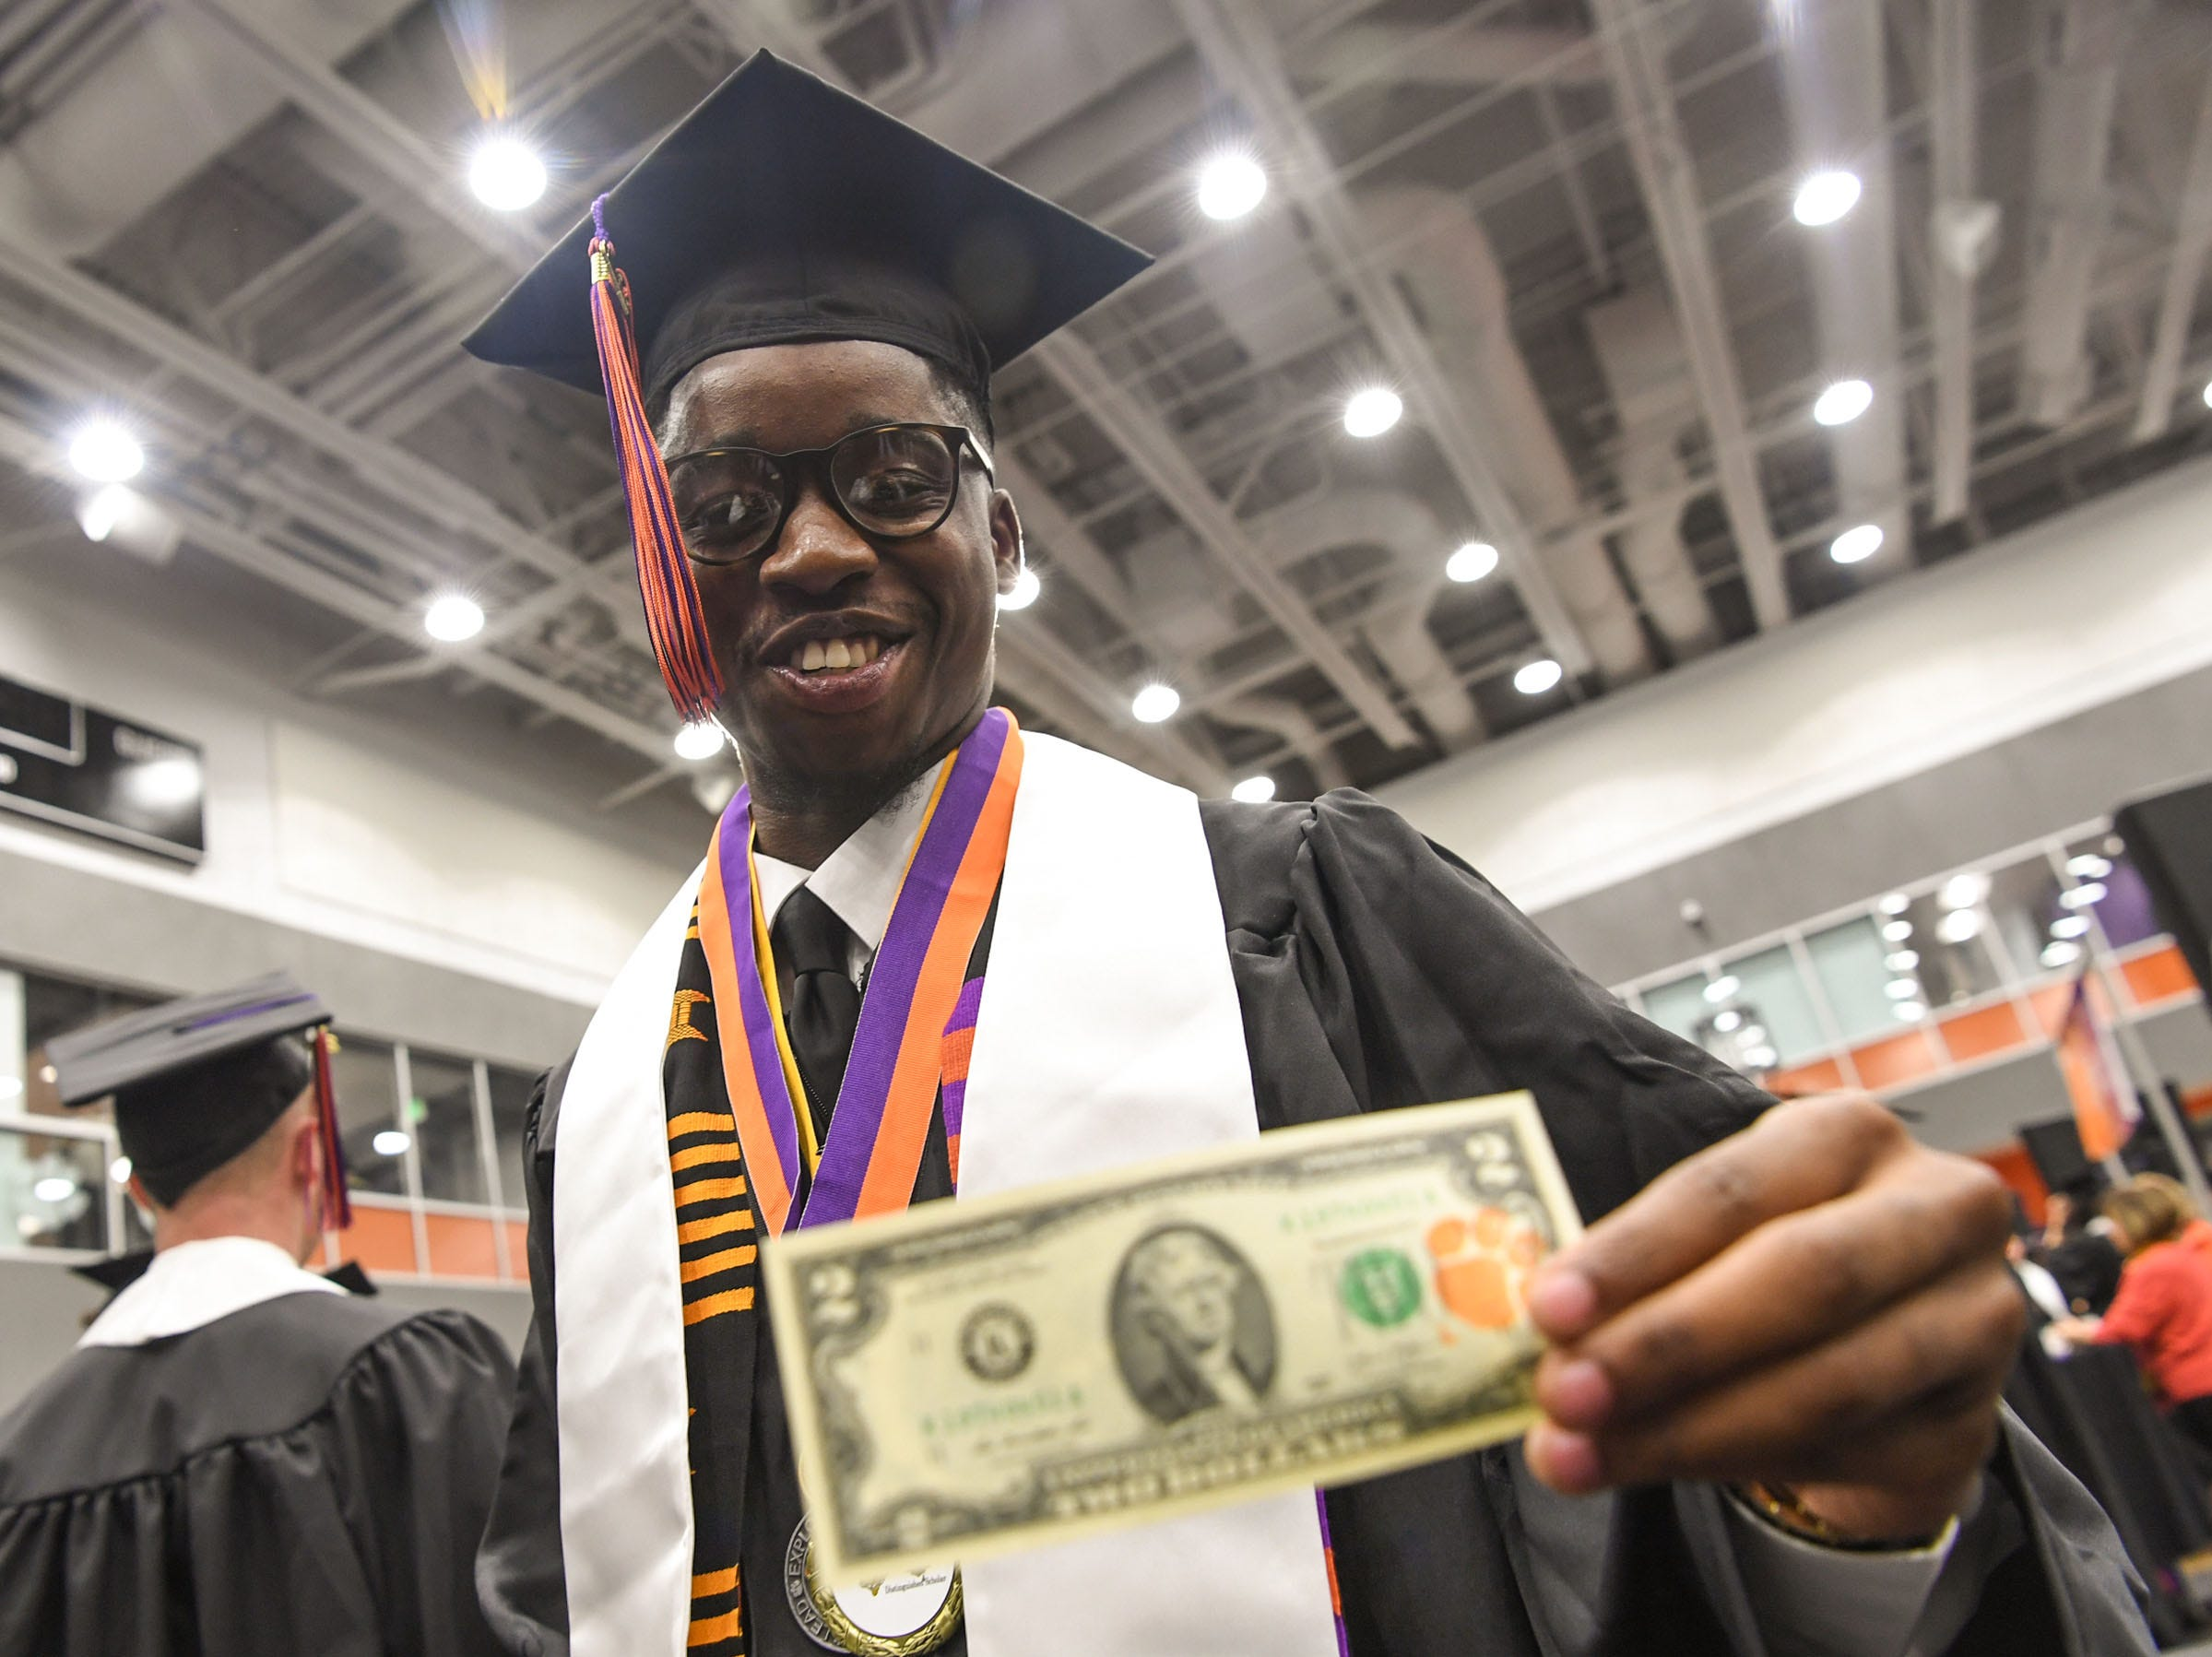 Willie Webb of Beafort, S.C. holds a Tiger Two dollar bill before the Clemson University morning graduation ceremony Thursday morning in Littlejohn Coliseum in Clemson.